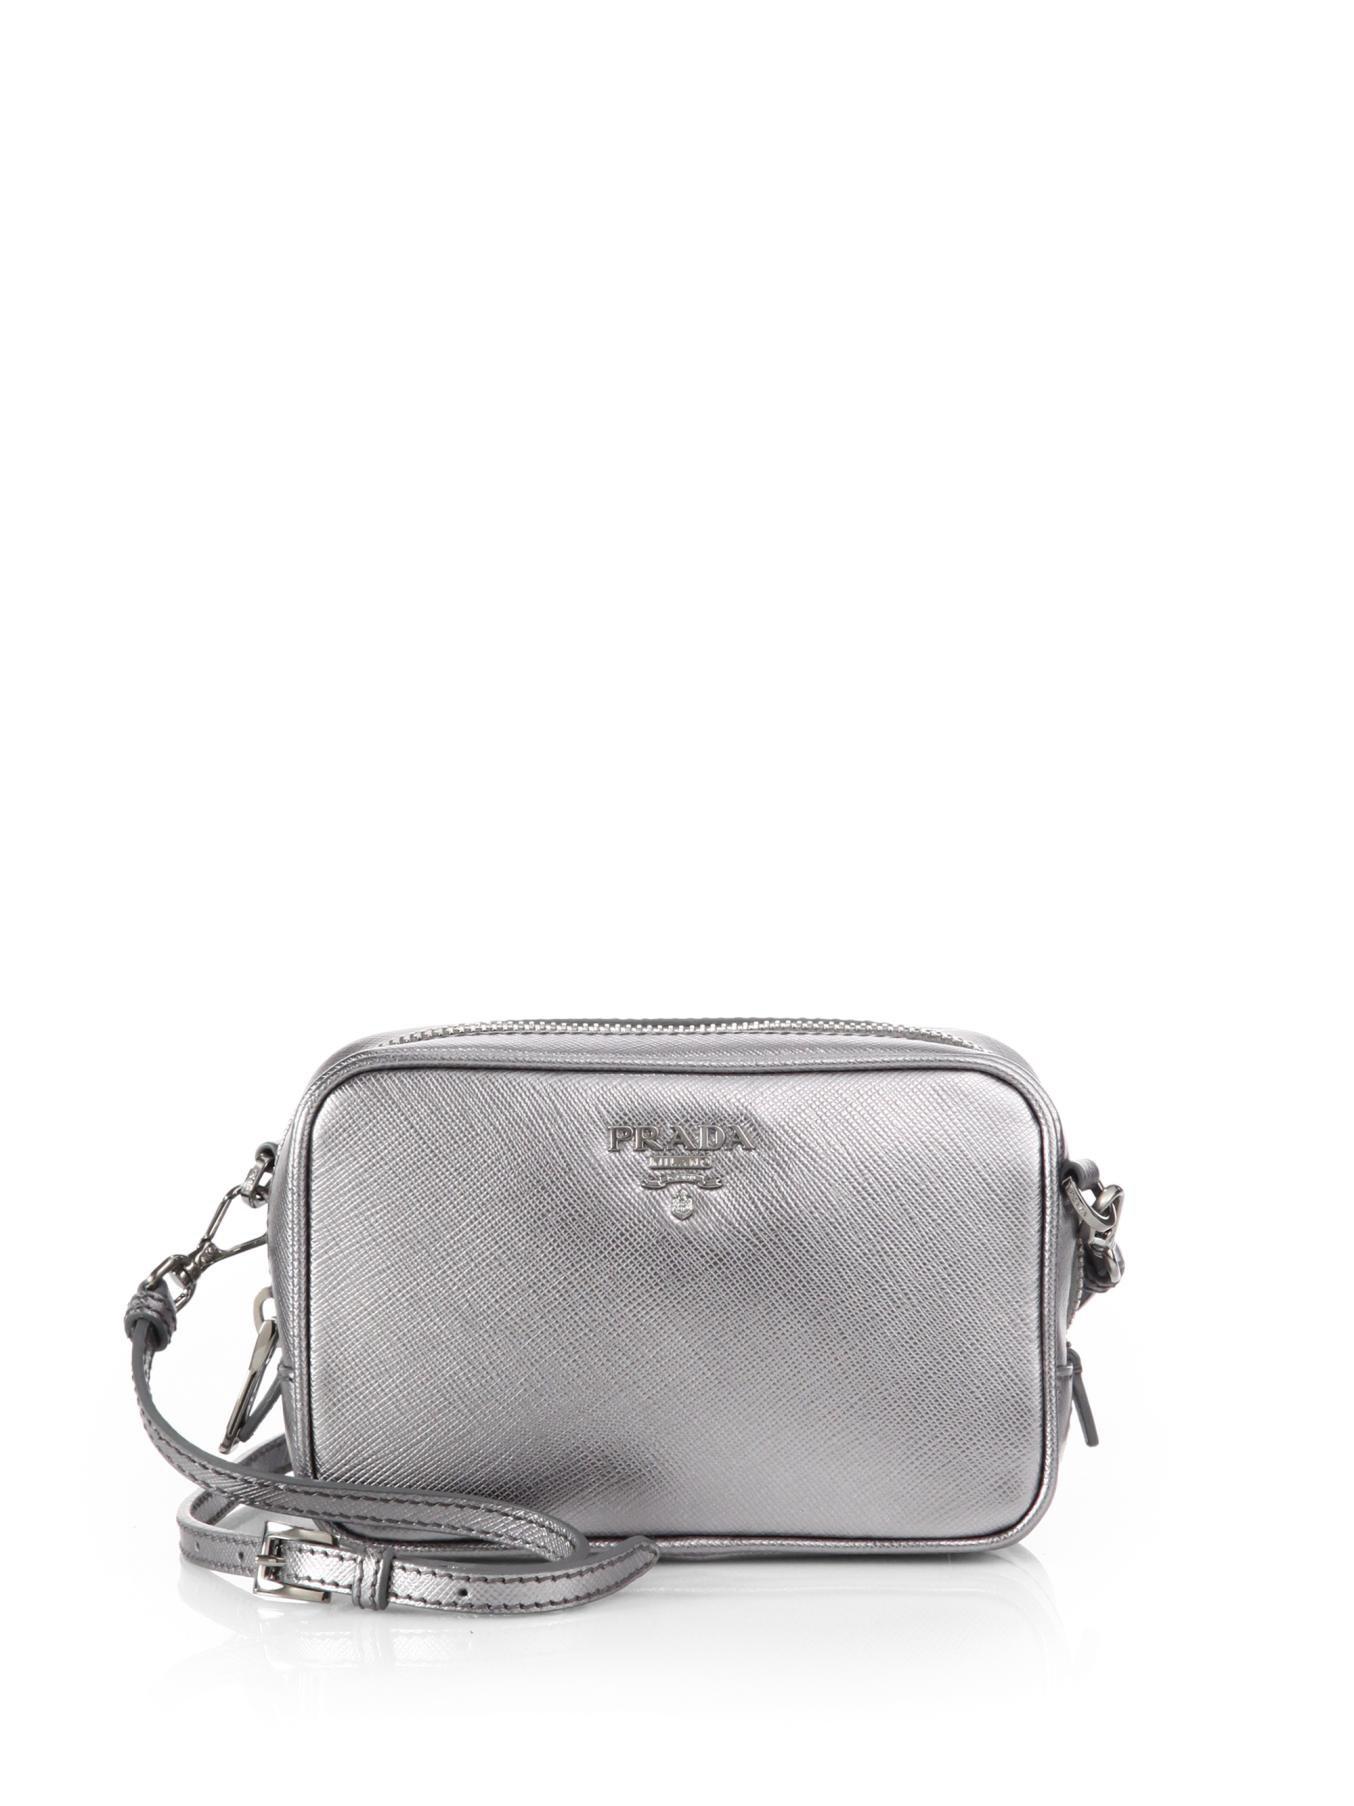 b42f3e8d814b ... new zealand lyst prada saffiano leather camera bag in metallic 53bf4  bbbb0